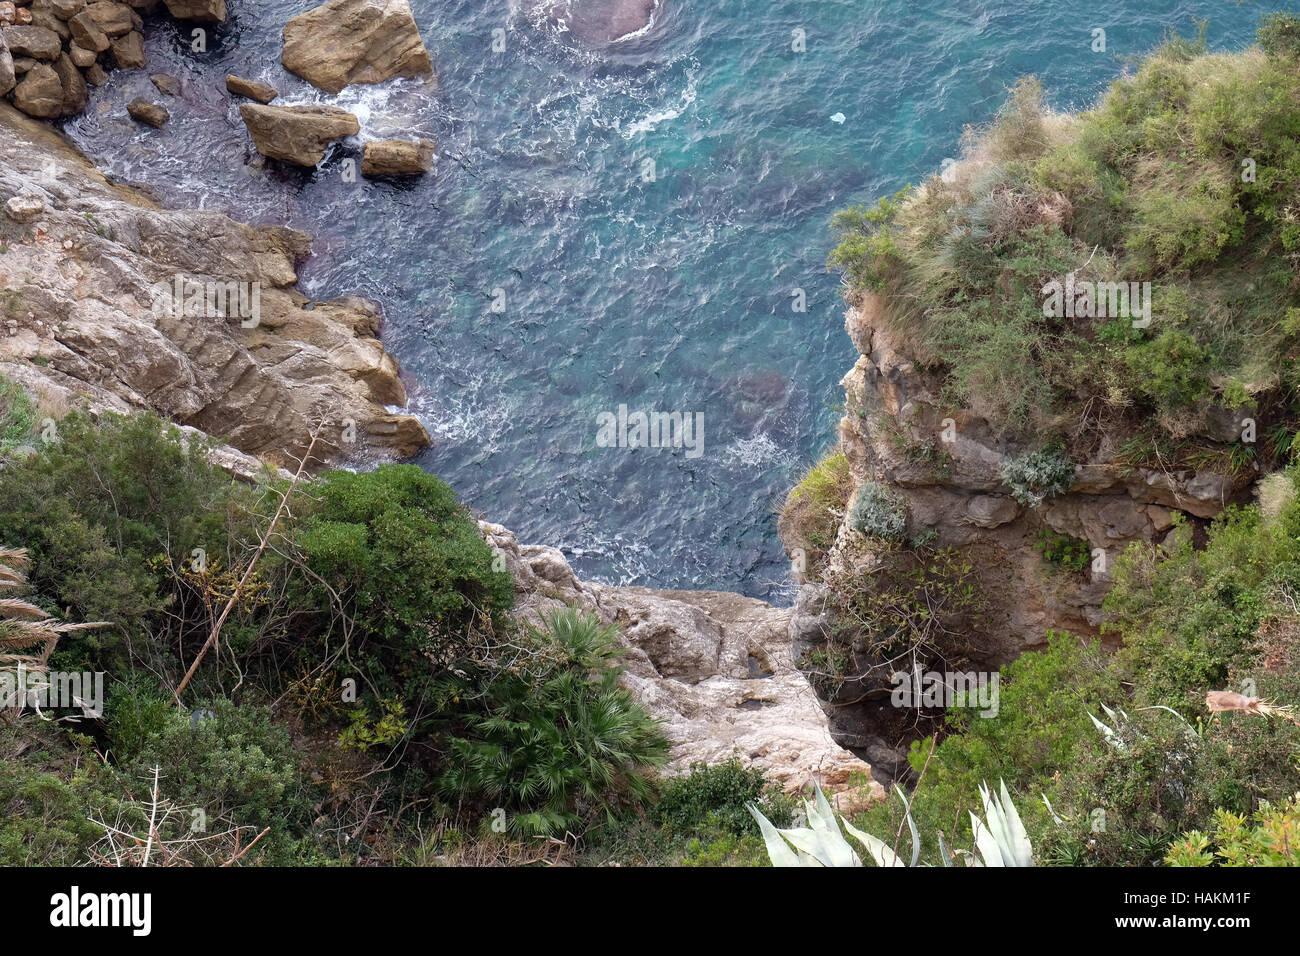 Pictorial blue Adriatic sea in Dubrovnik, Croatia on December 01, 2015. - Stock Image